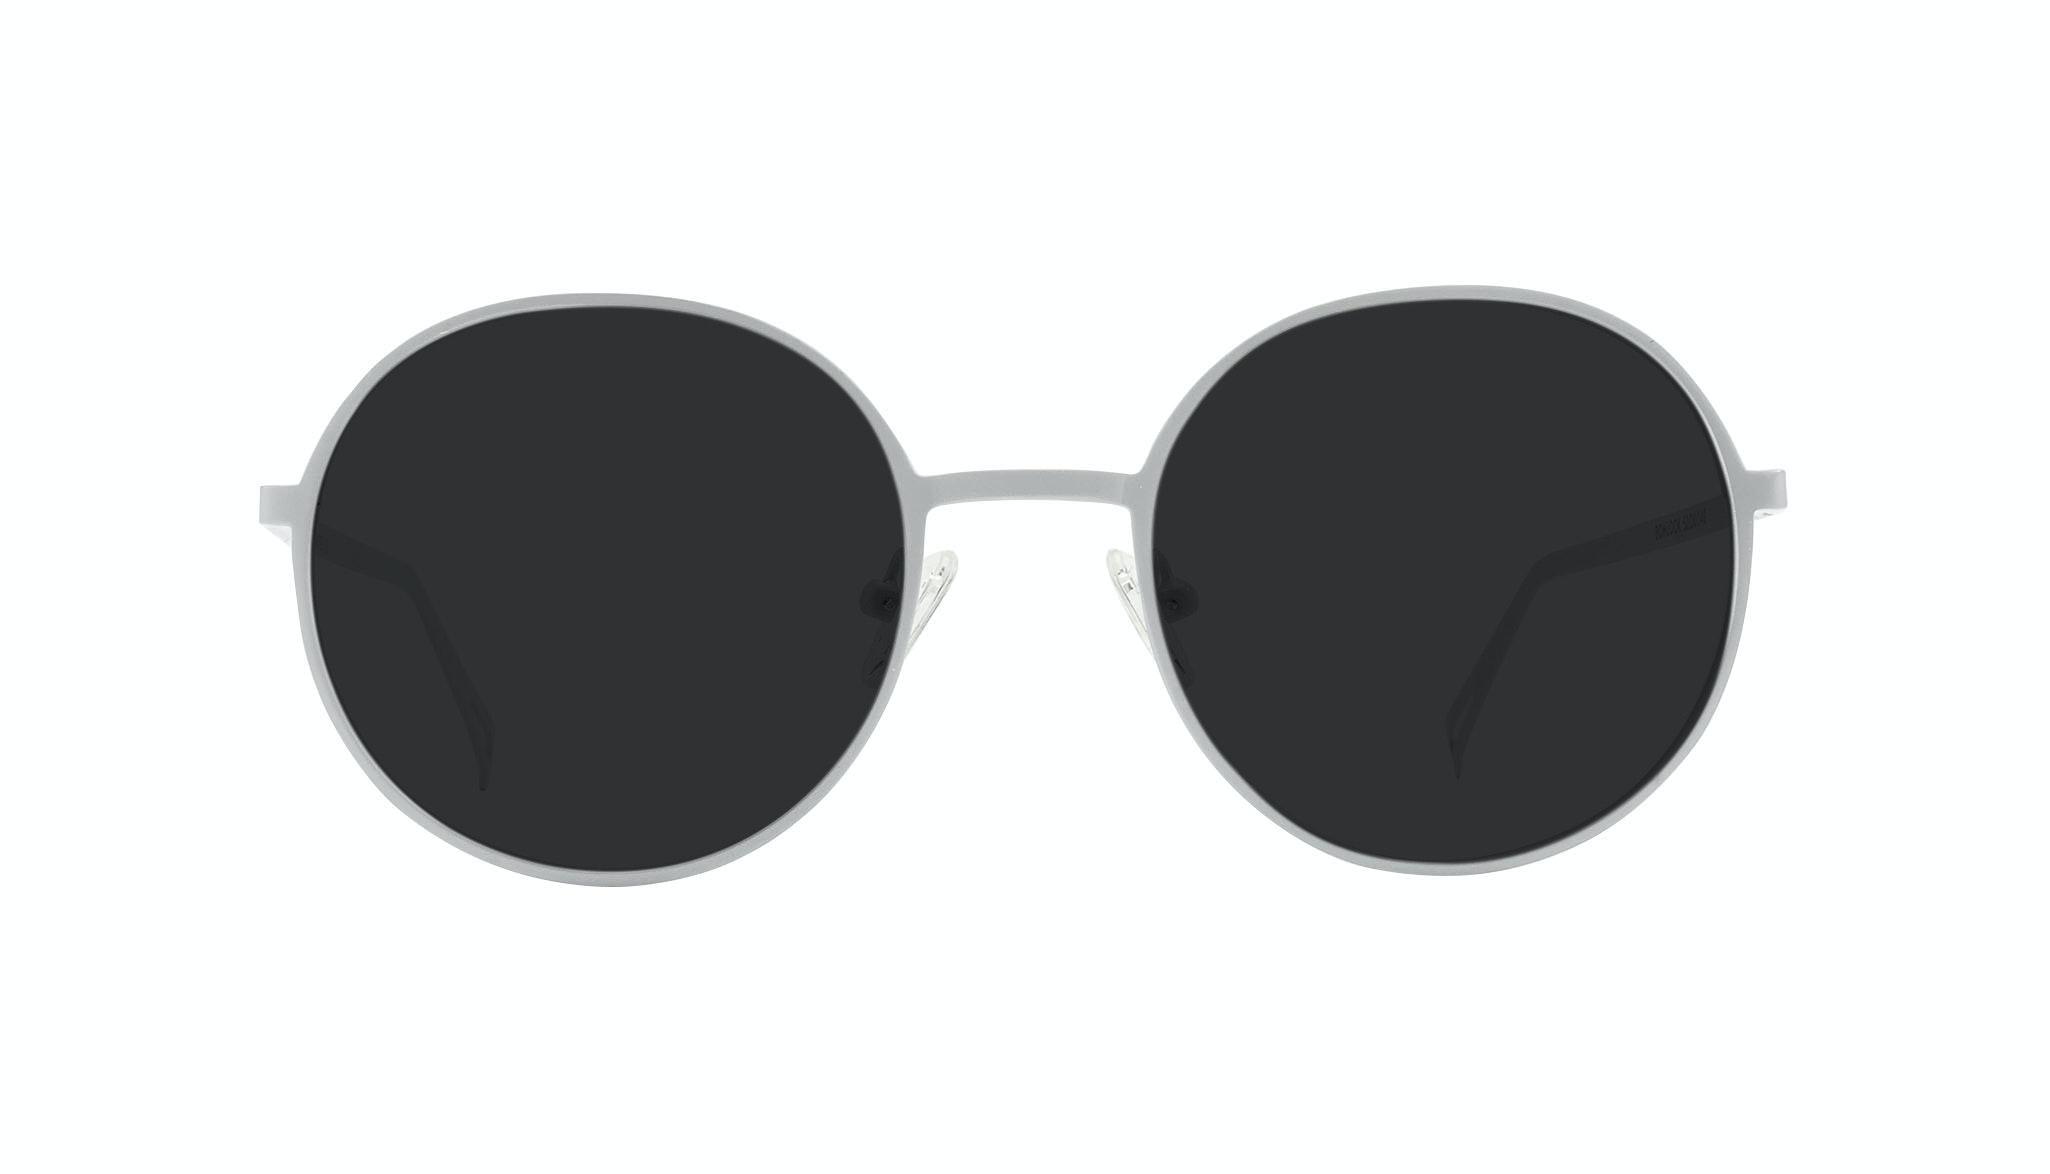 Affordable Fashion Glasses Round Sunglasses Men Women Varna White Front